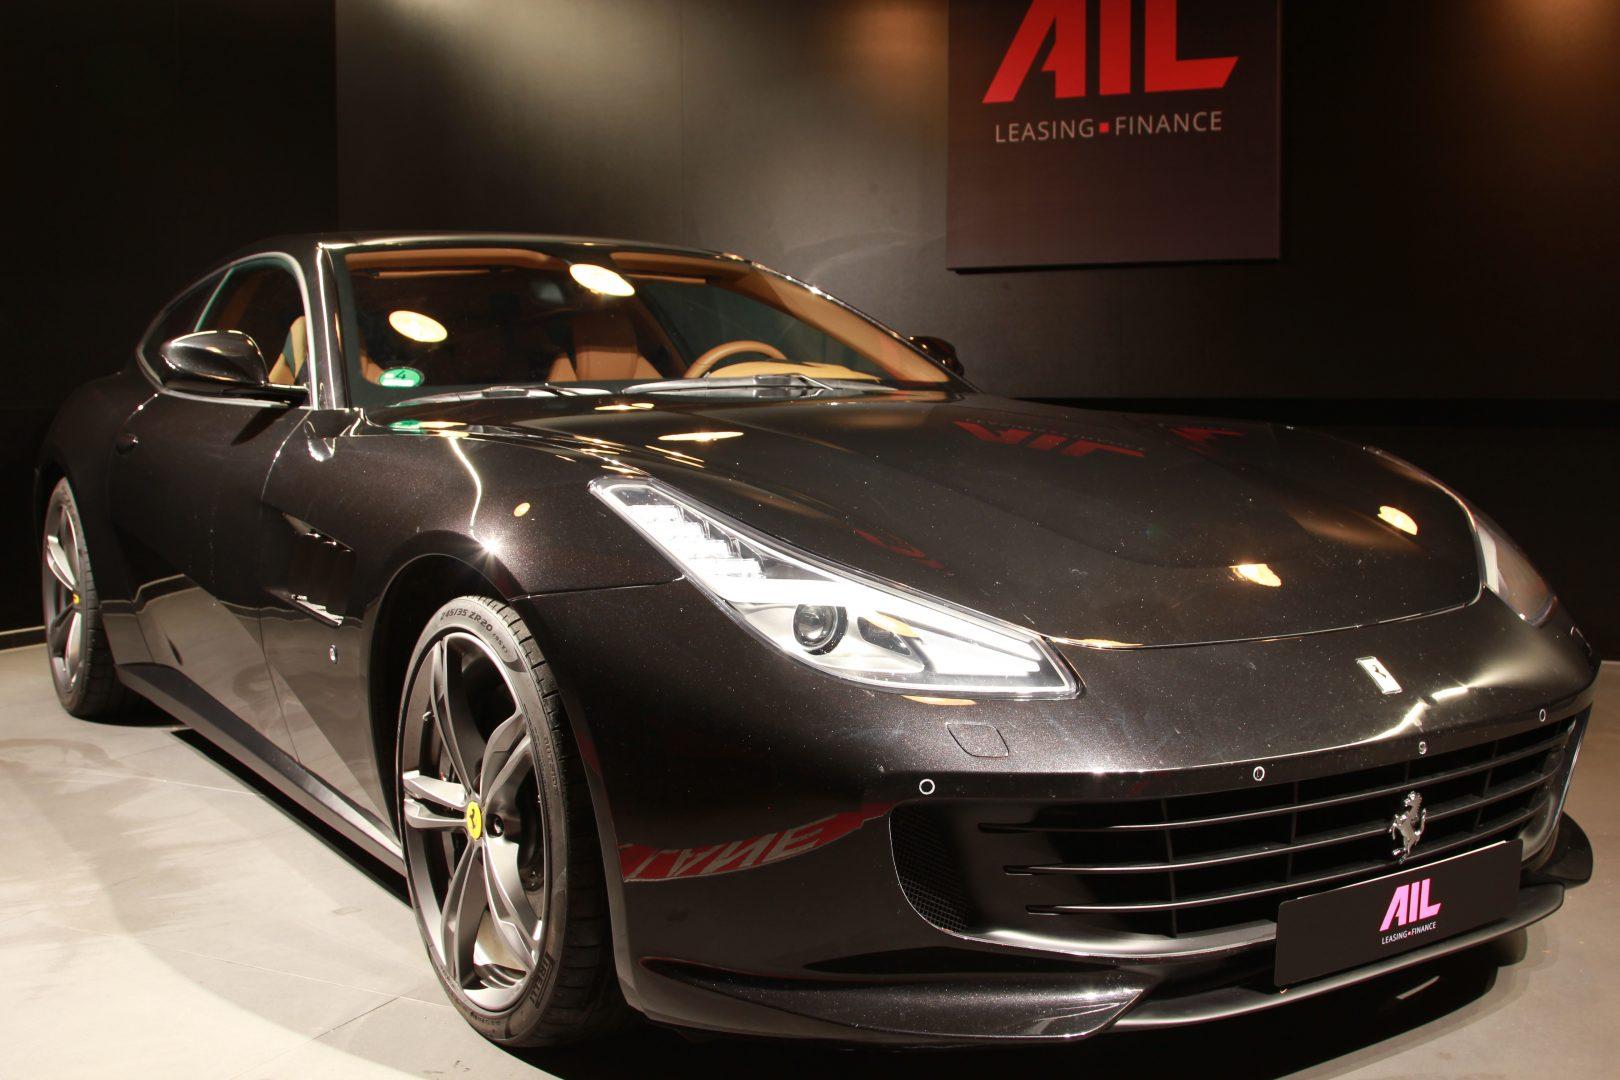 AIL Ferrari GTC4Lusso 13